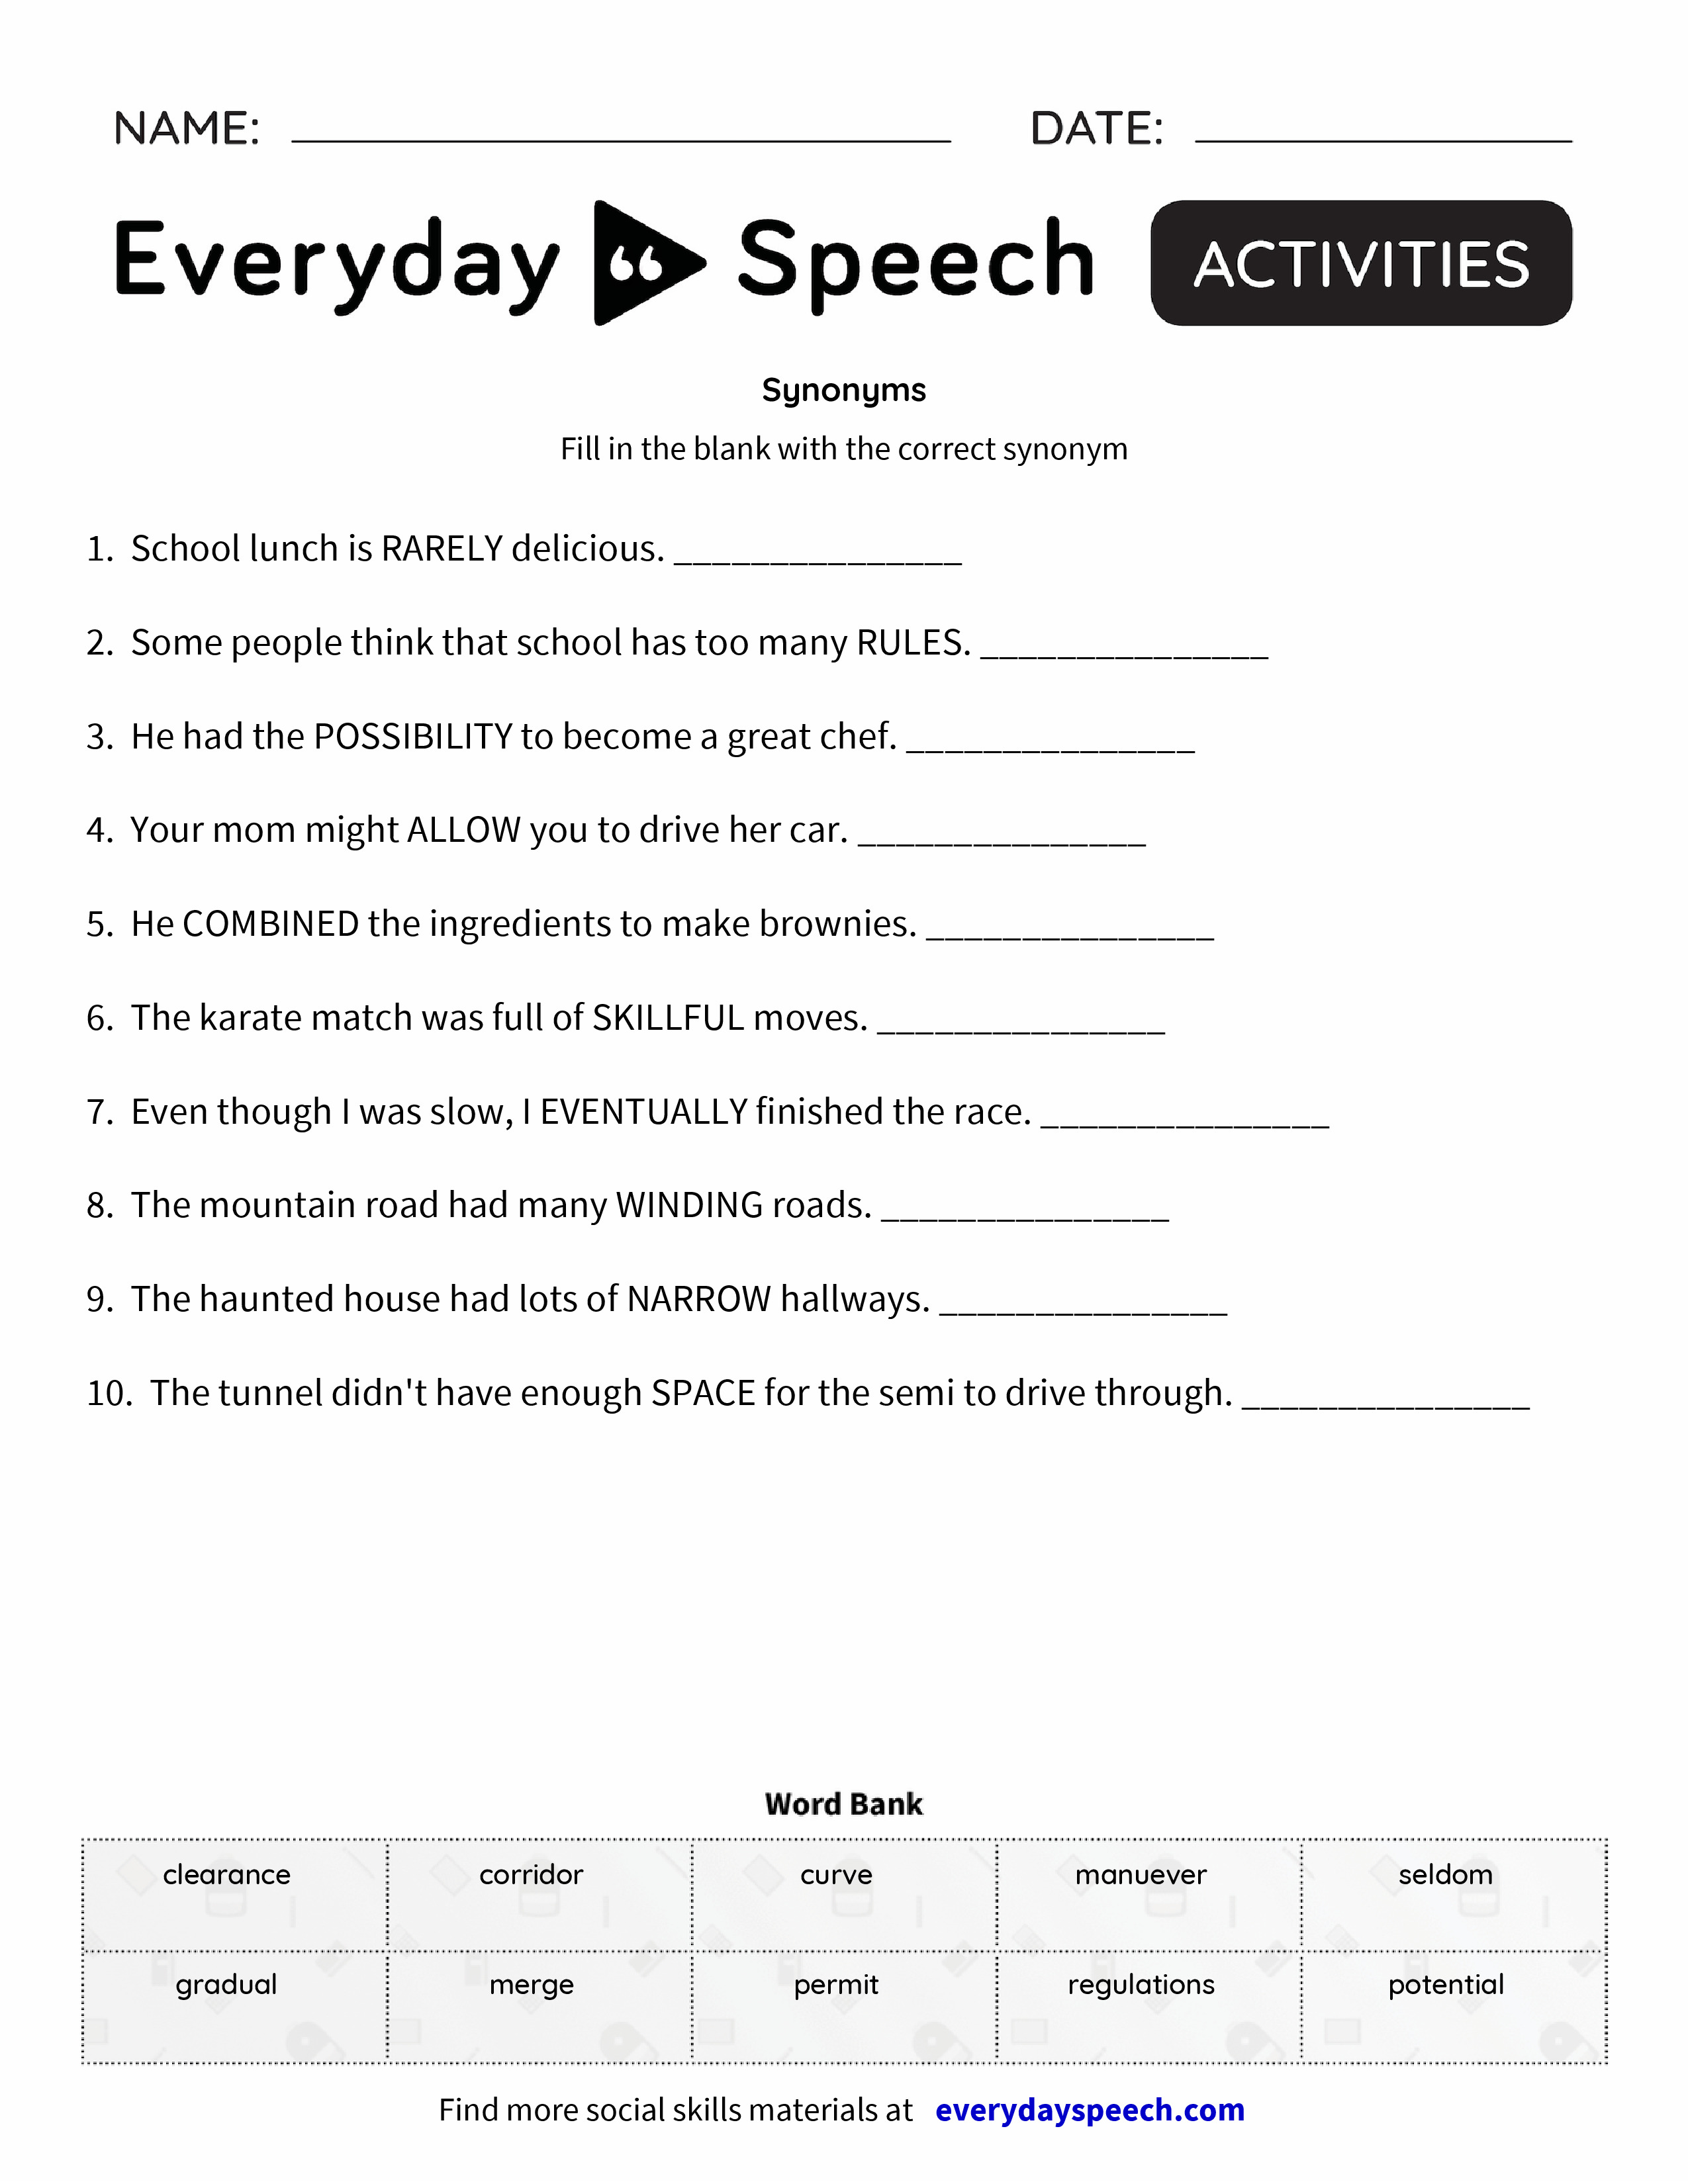 Synonyms Everyday Speech Everyday Speech